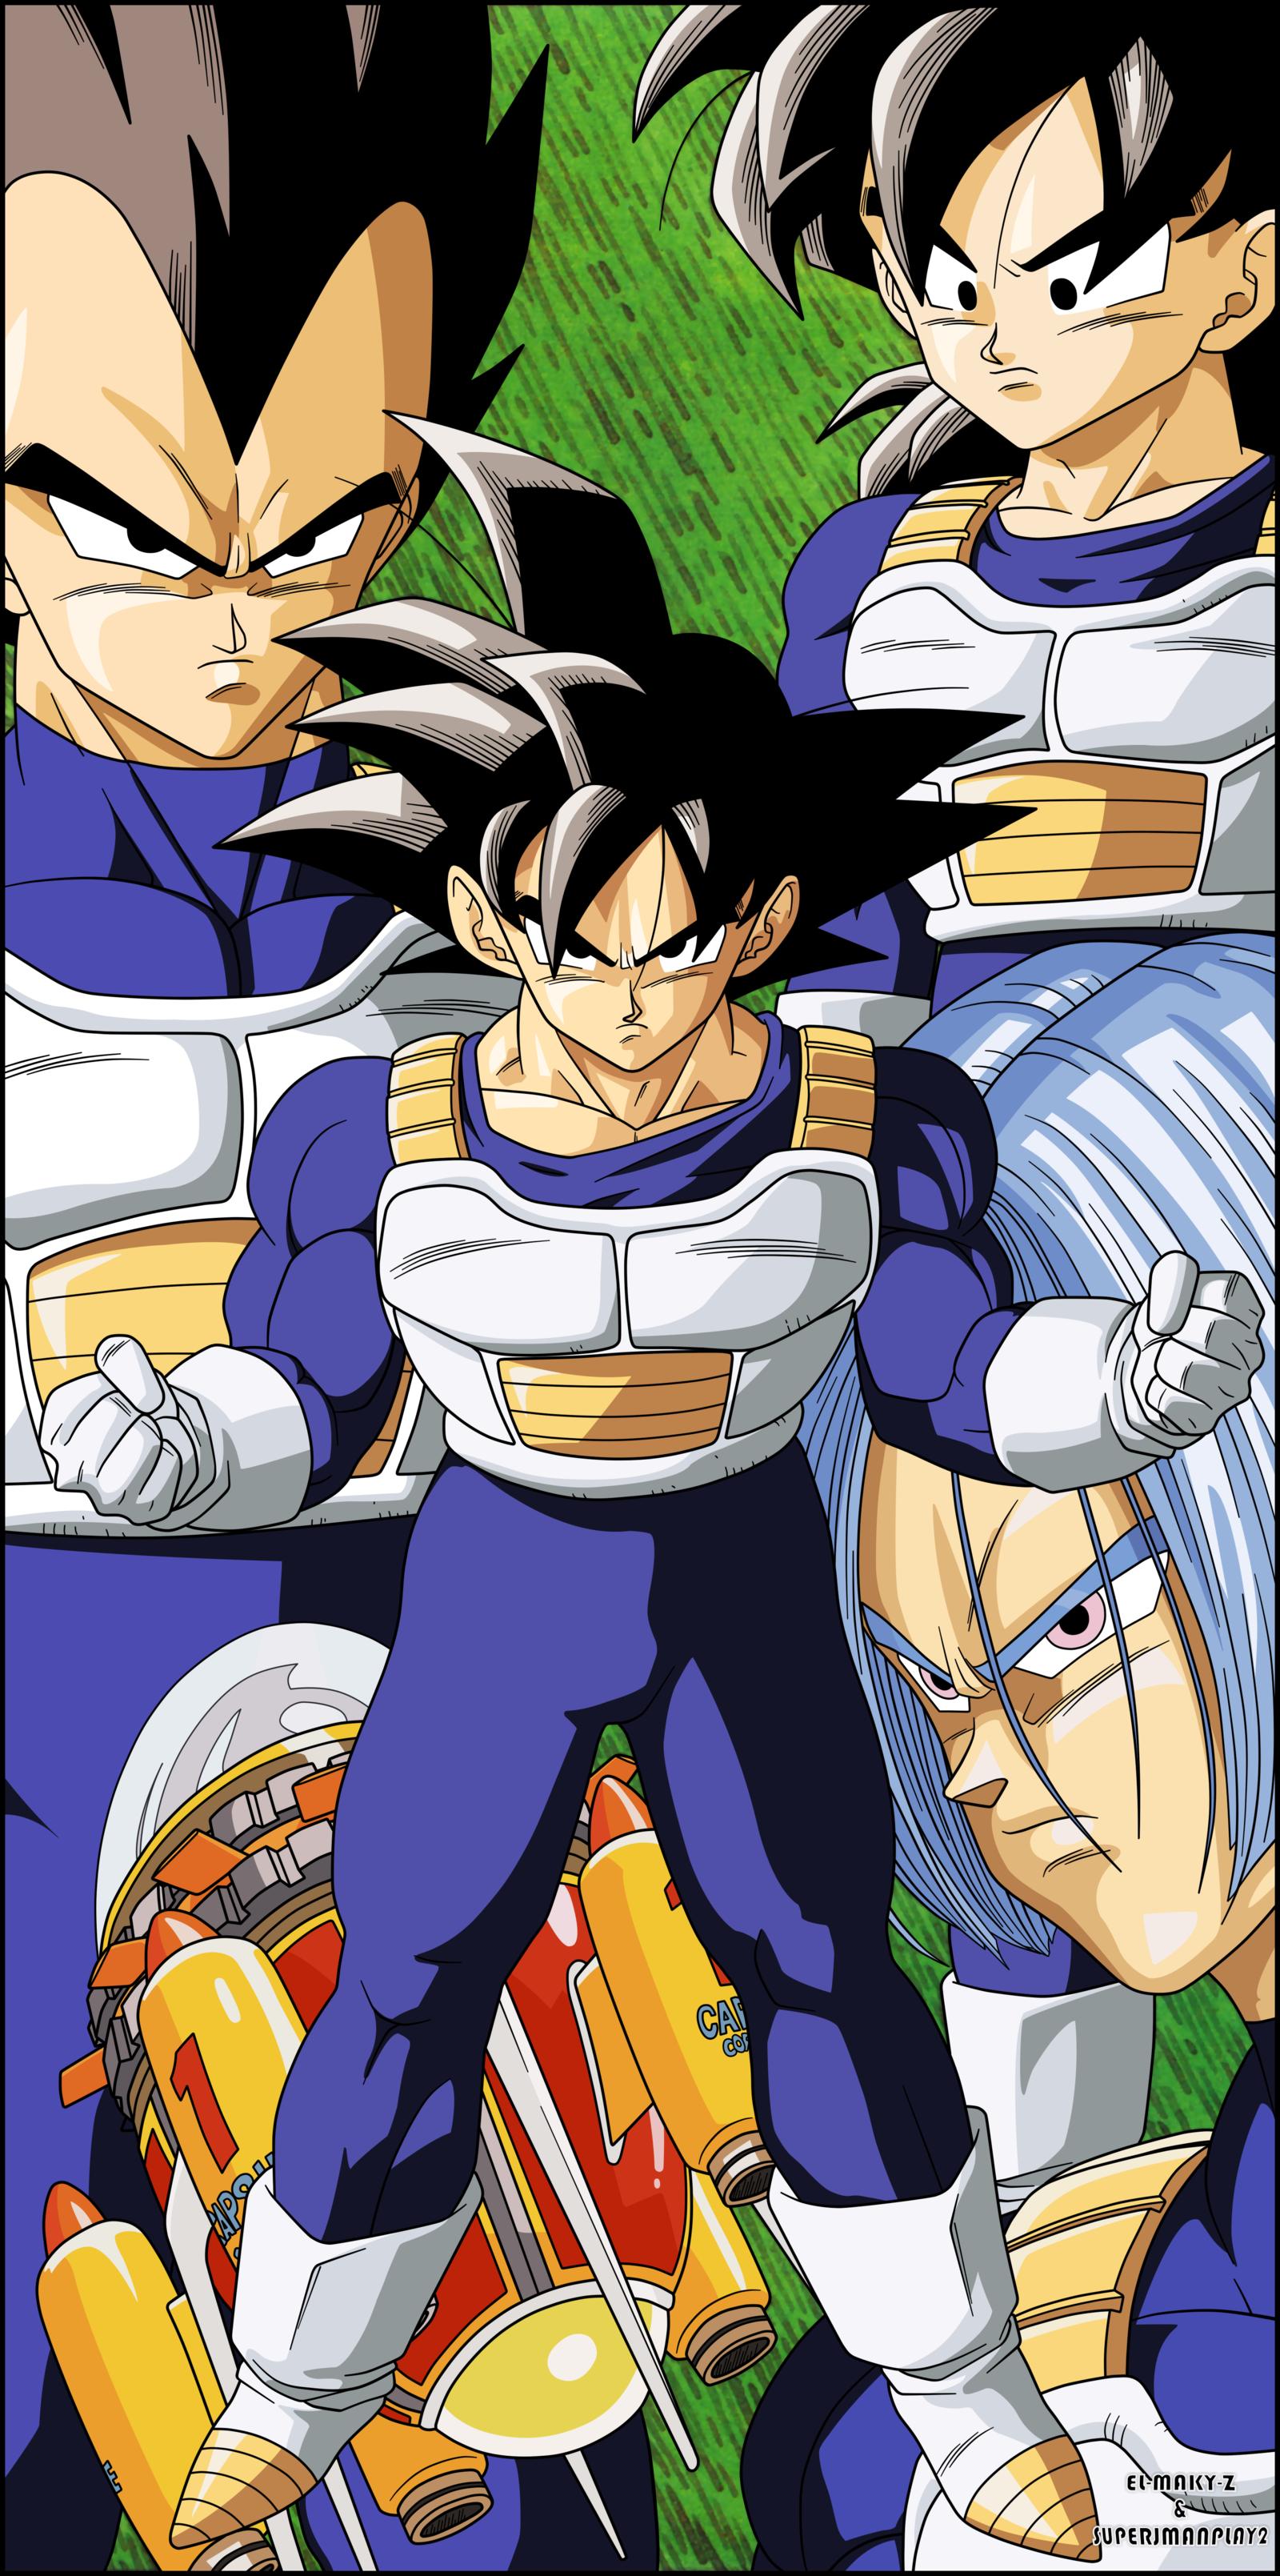 Dragon Ball Z Saiyans By El Maky Z On Deviantart Dragon Ball Artwork Dragon Ball Z Anime Dragon Ball Super